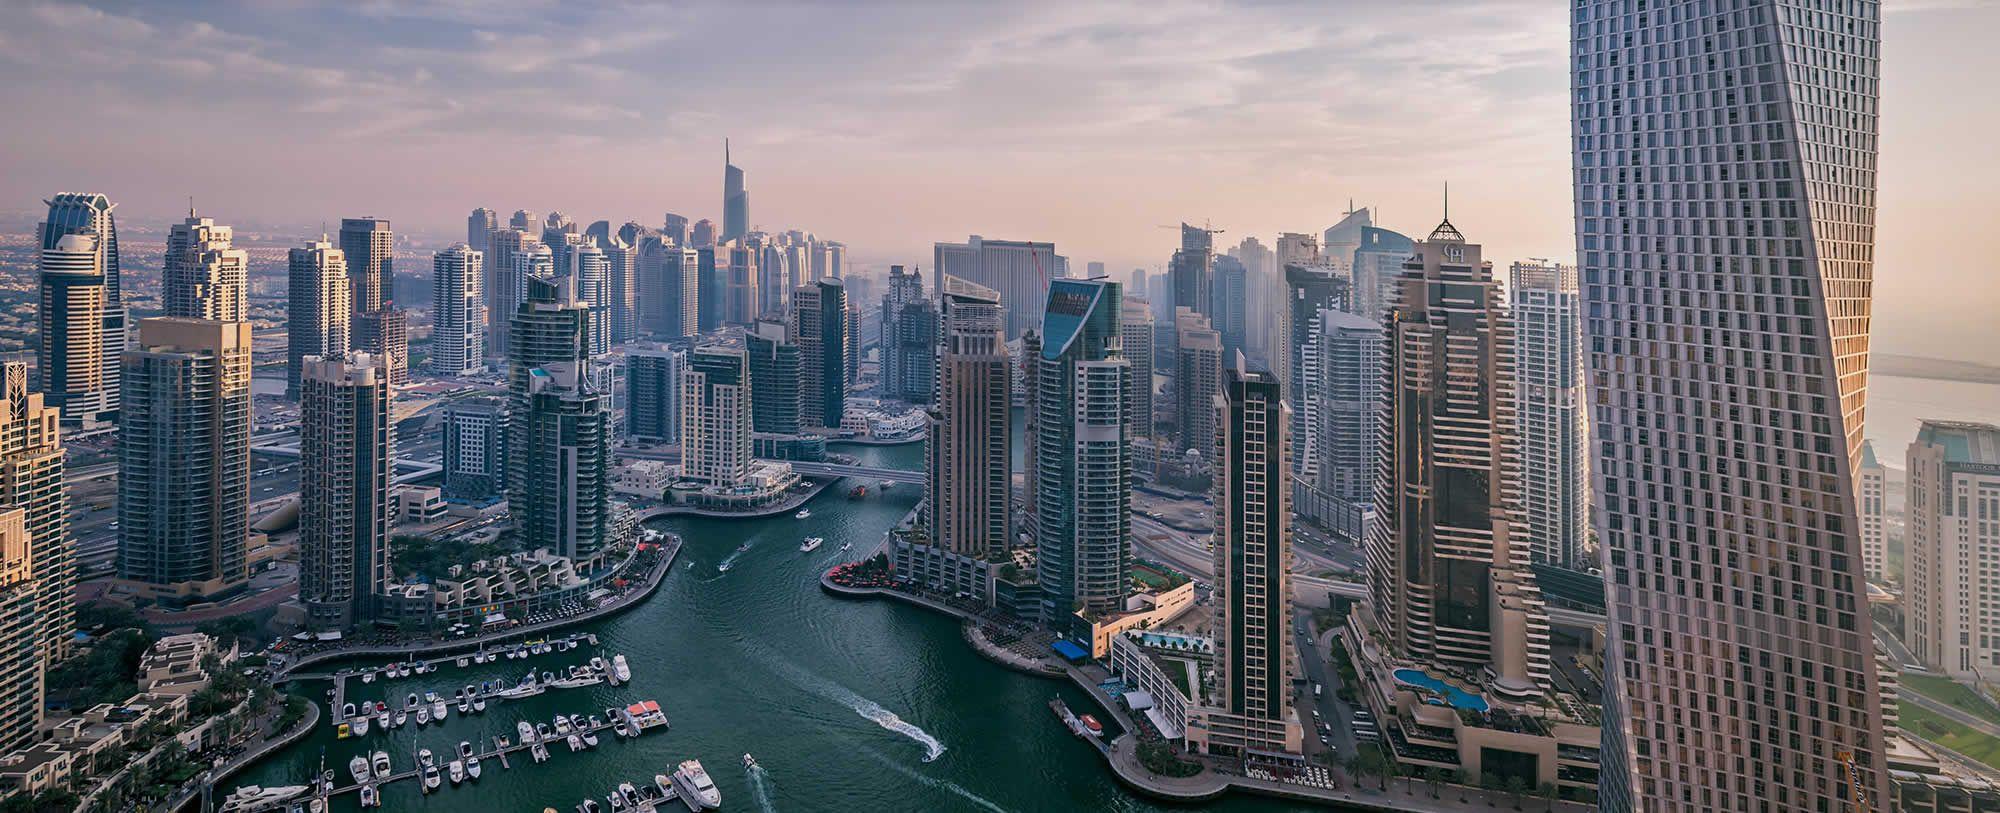 نتيجة بحث الصور عن Our Vision Dubai New York Skyline Skyline Travel